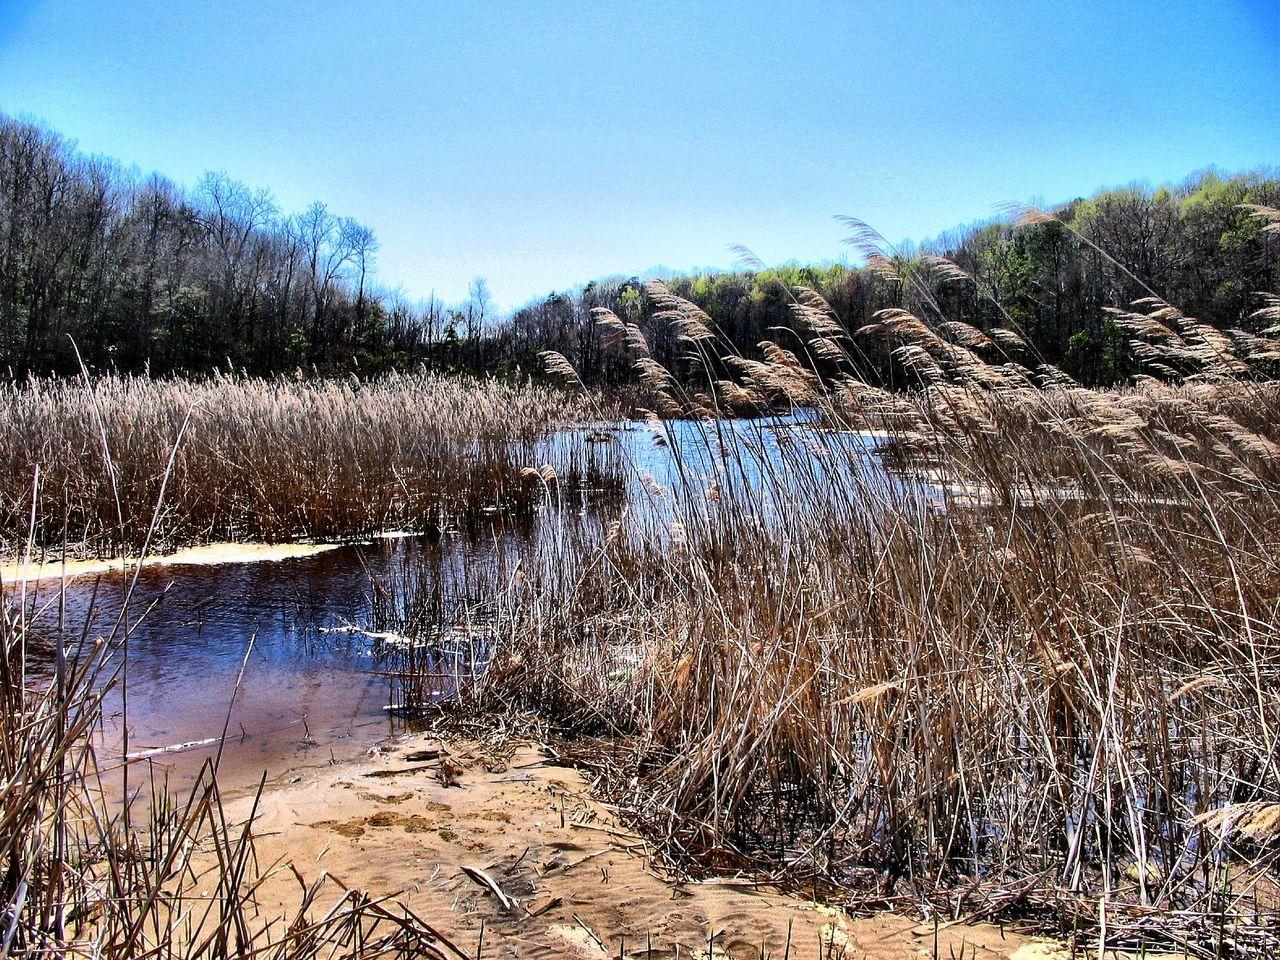 Water Splashing In Pond Against Clear Blue Sky